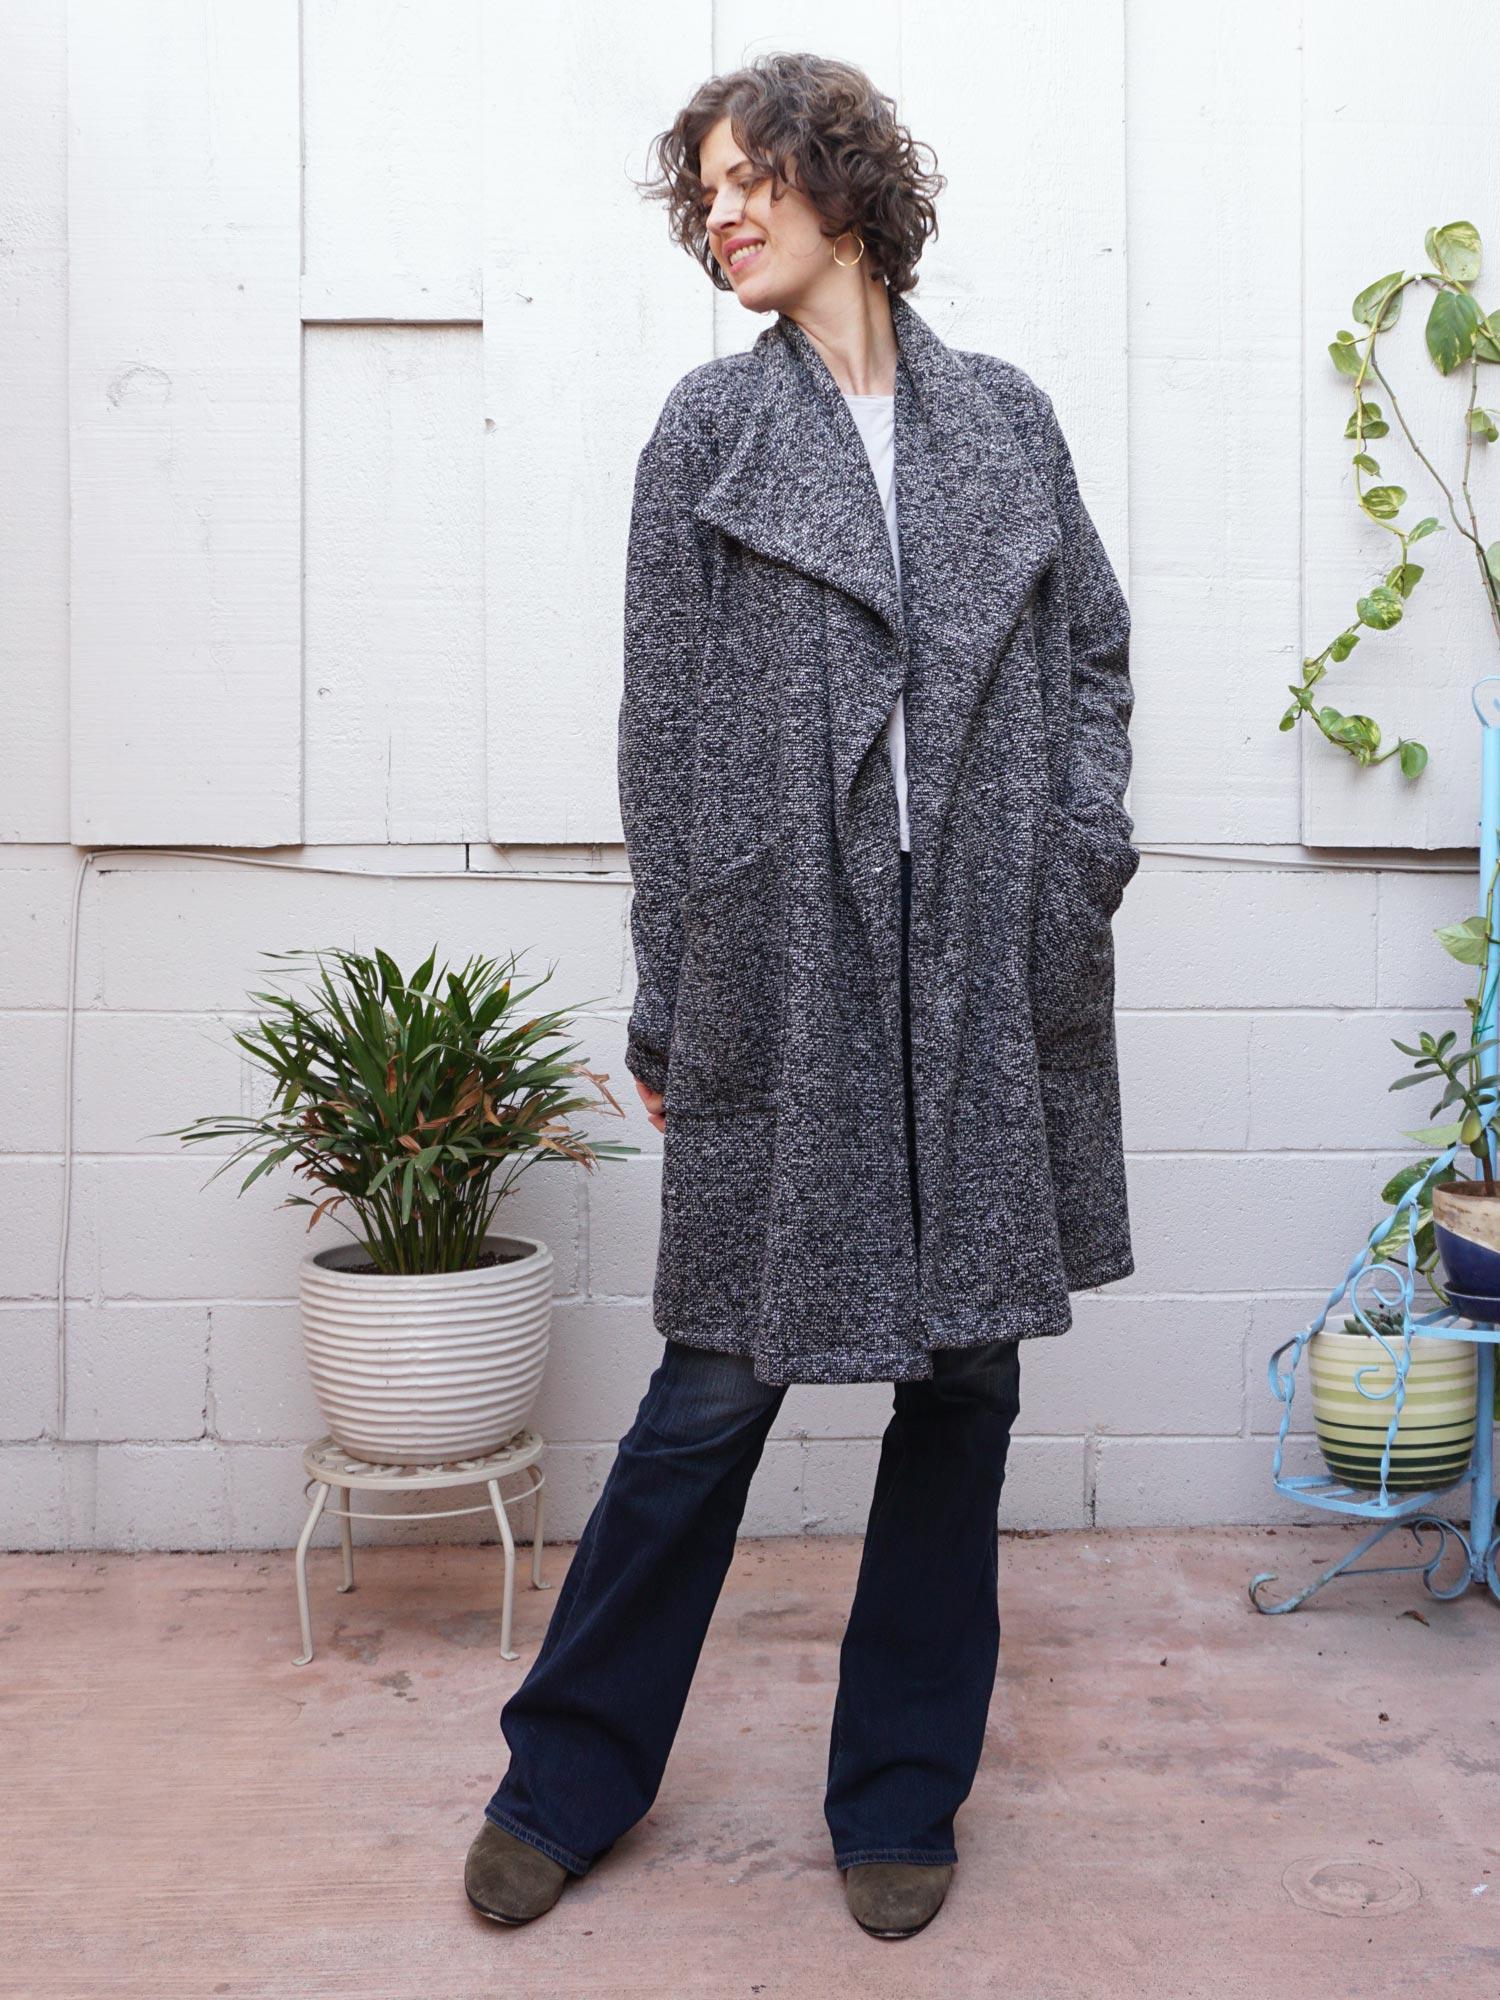 DIY Boucle Coatigan – Review of the Jill Coat by Seamwork | Sew DIY